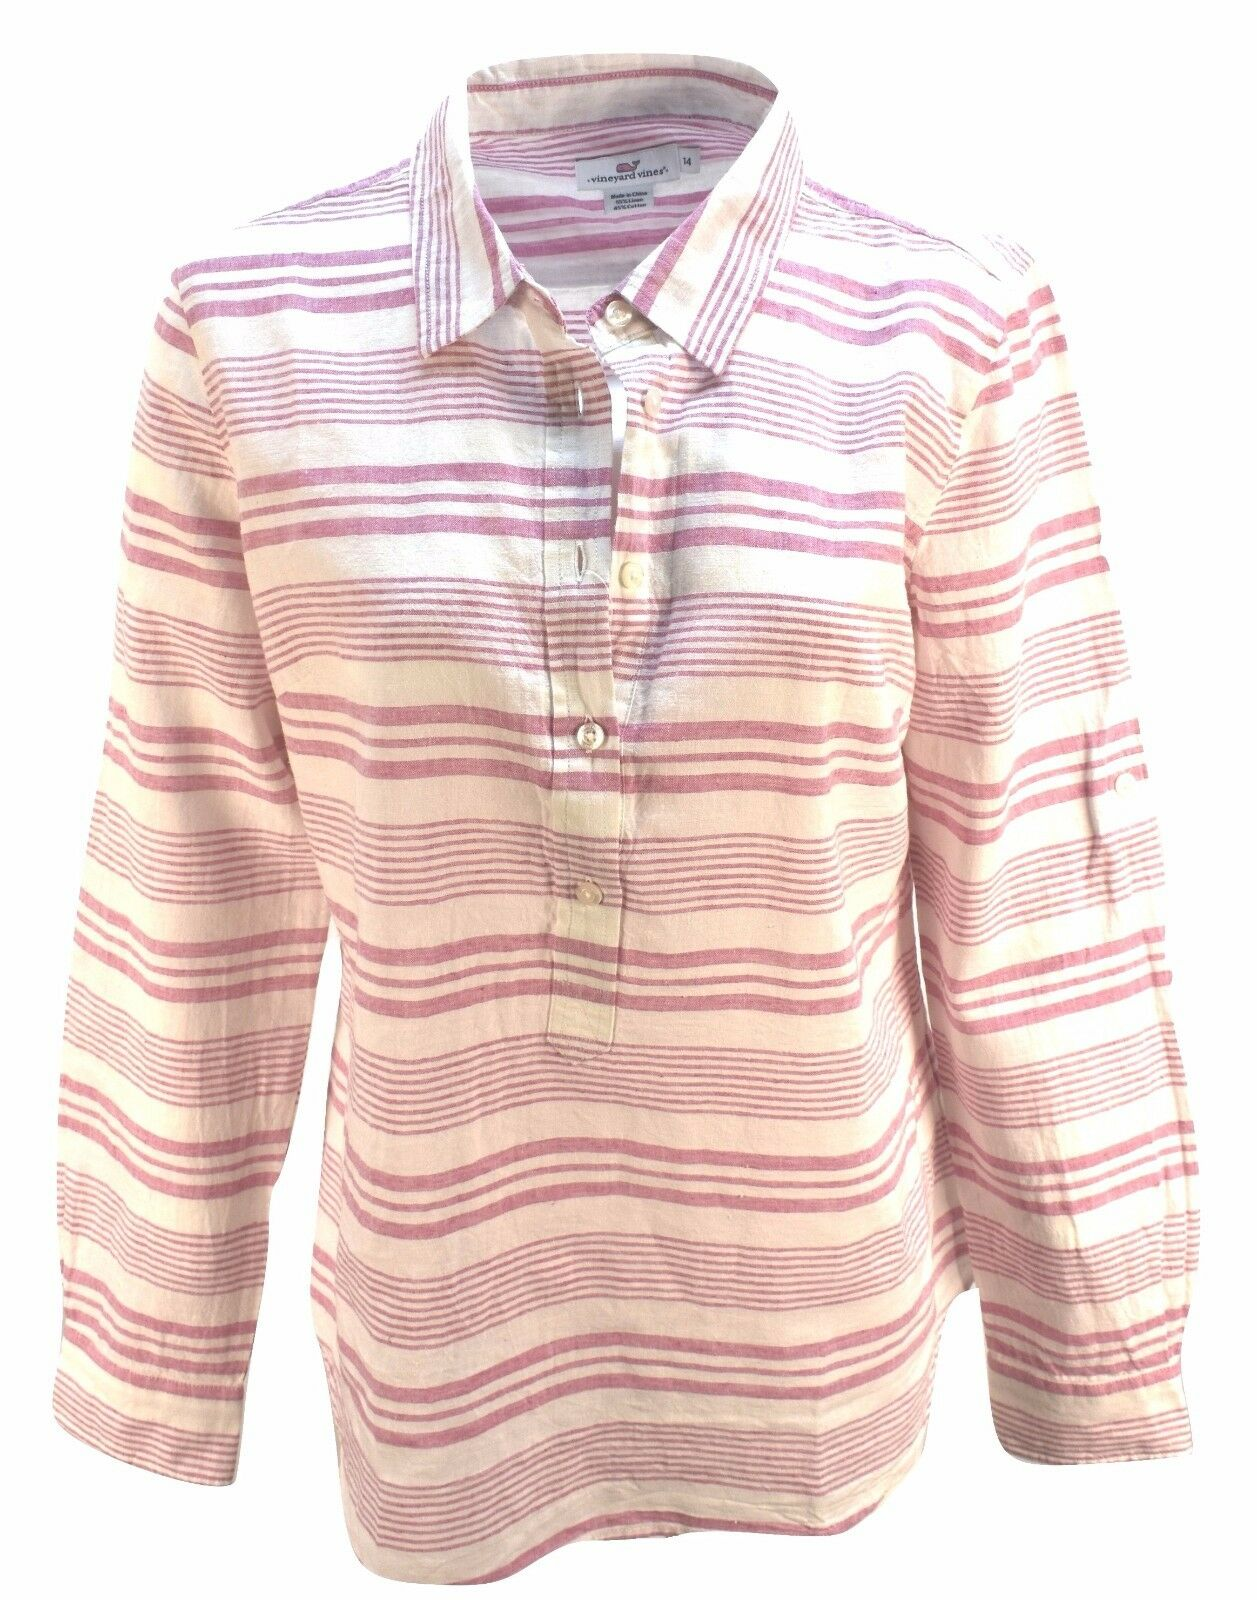 Vineyard Vines Woherren Bungalow Beach Cover up Shirt Stripe Rosa linen